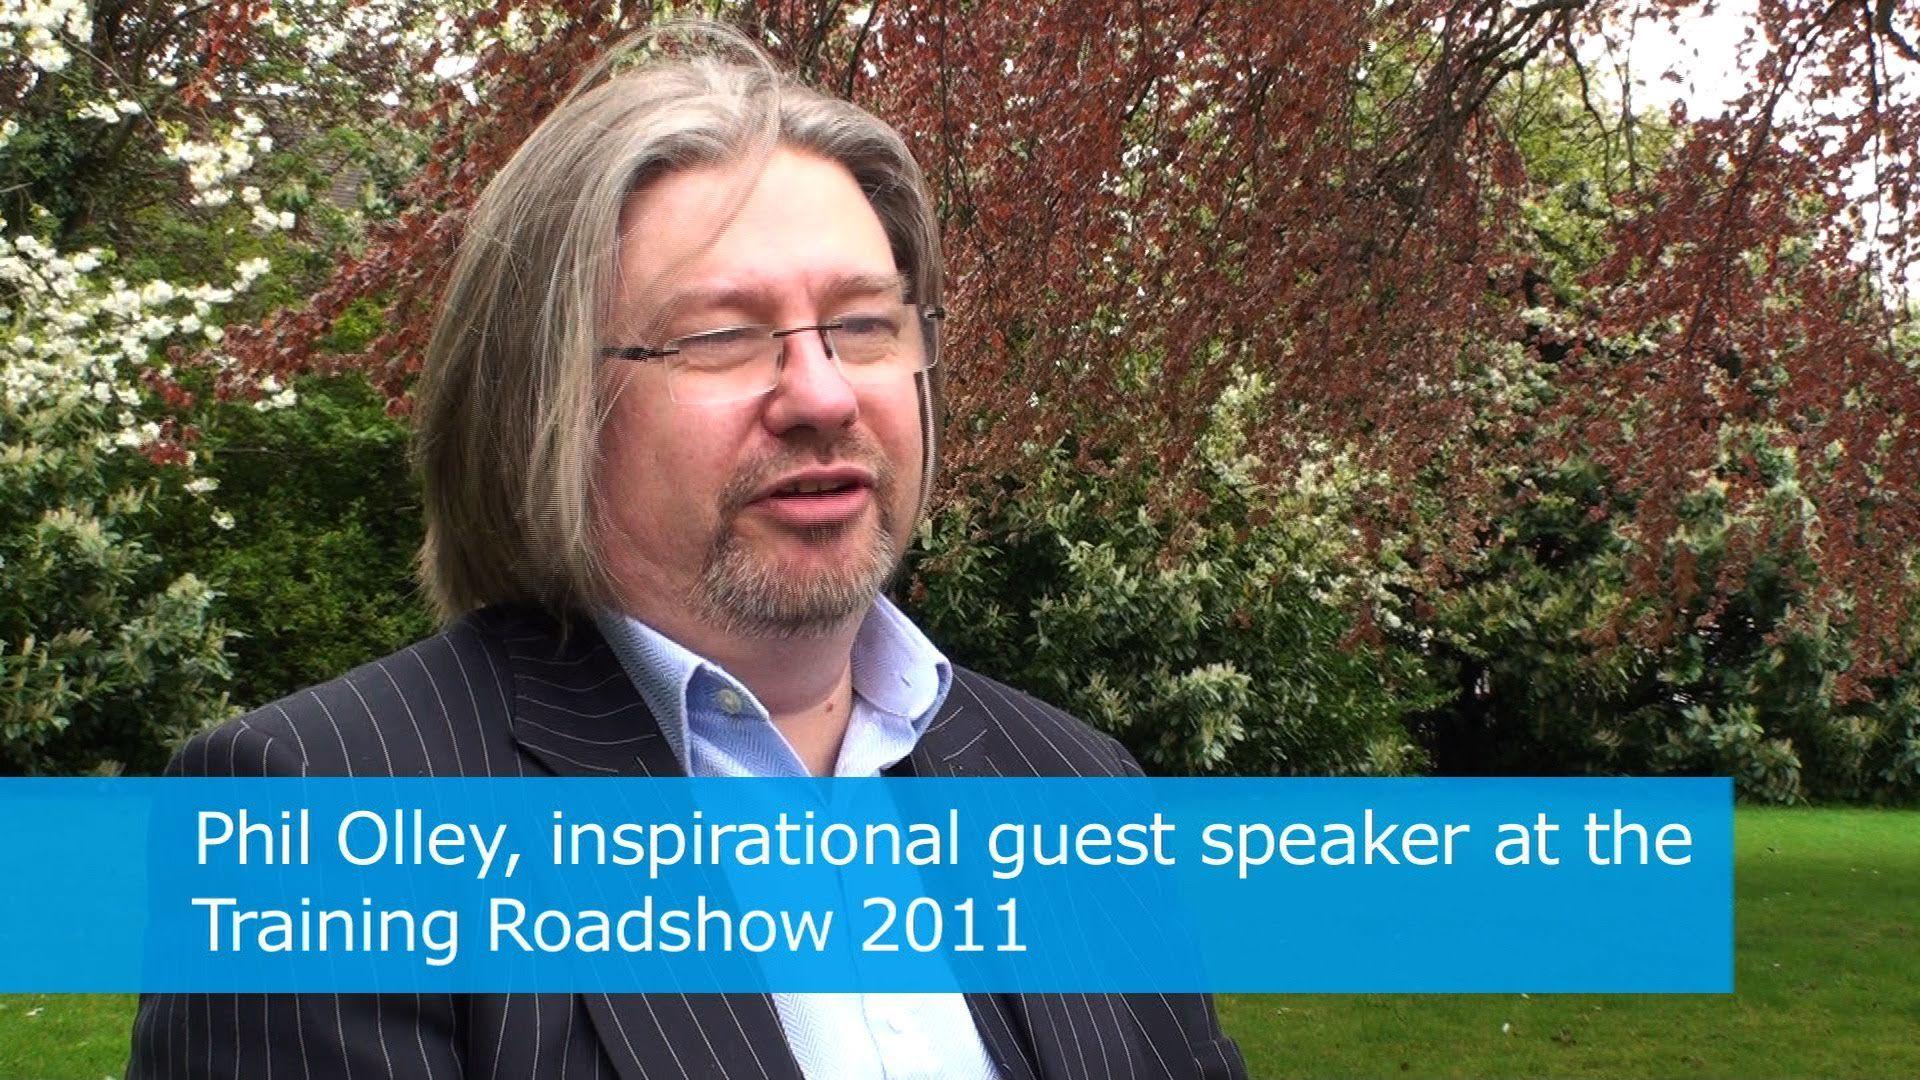 Training roadshow guest speaker Phil Olley in 2011. Peak